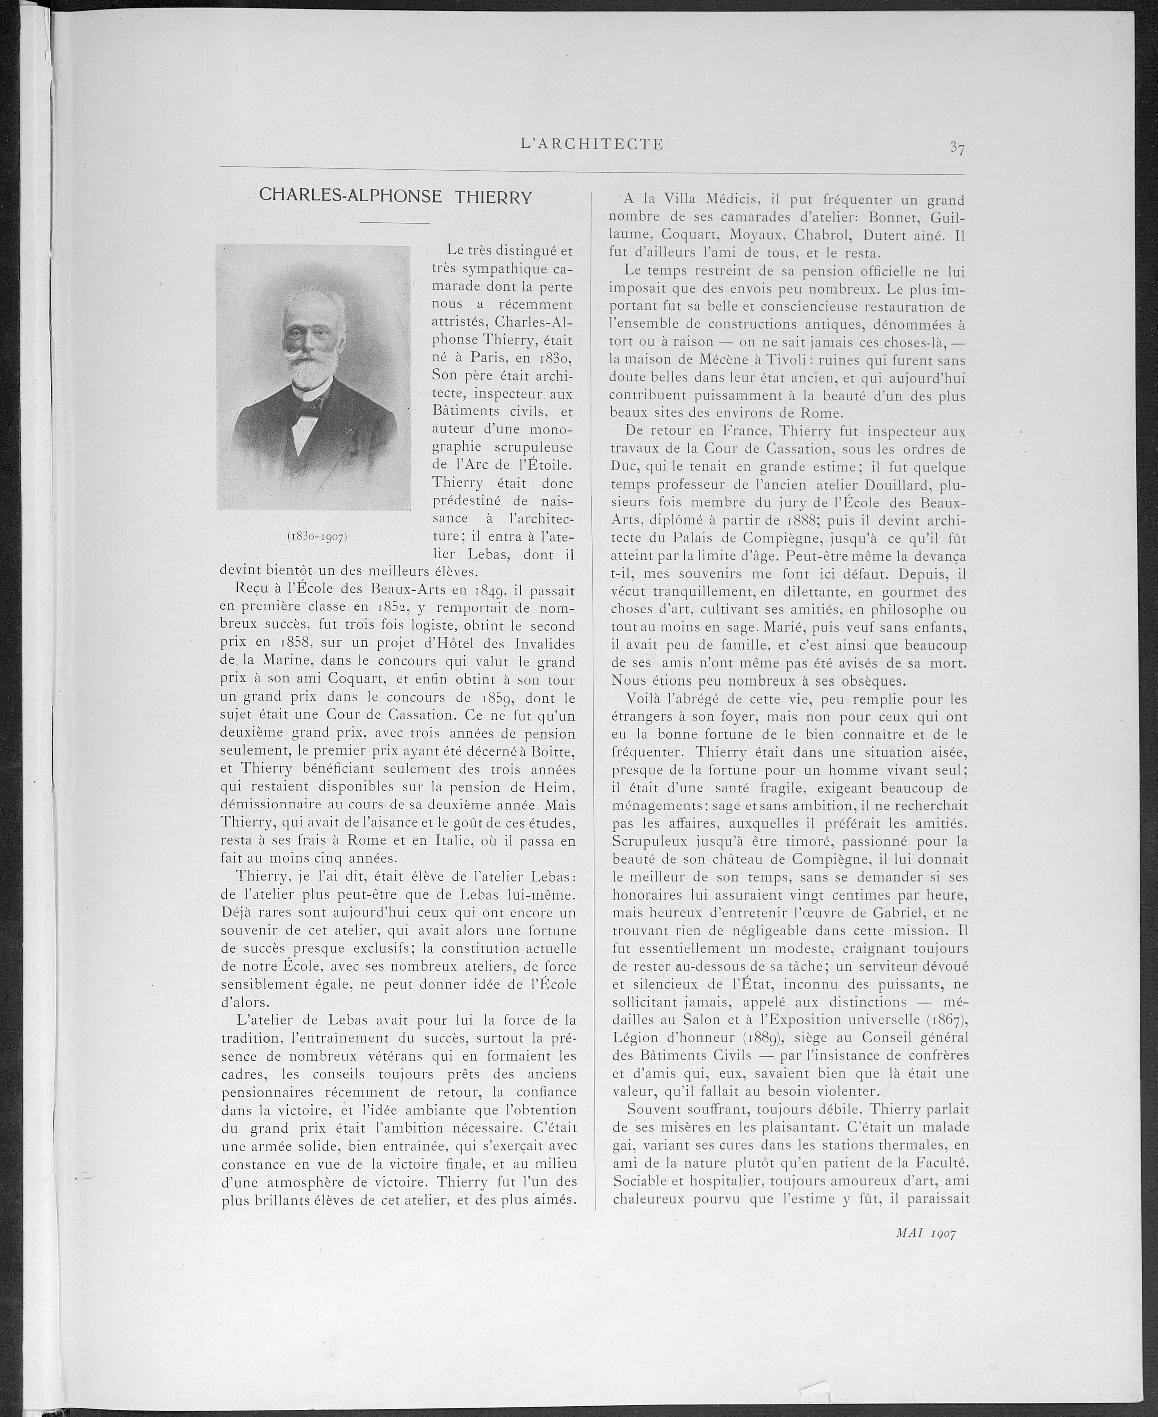 L'Architecte, no. 5, 1907 |